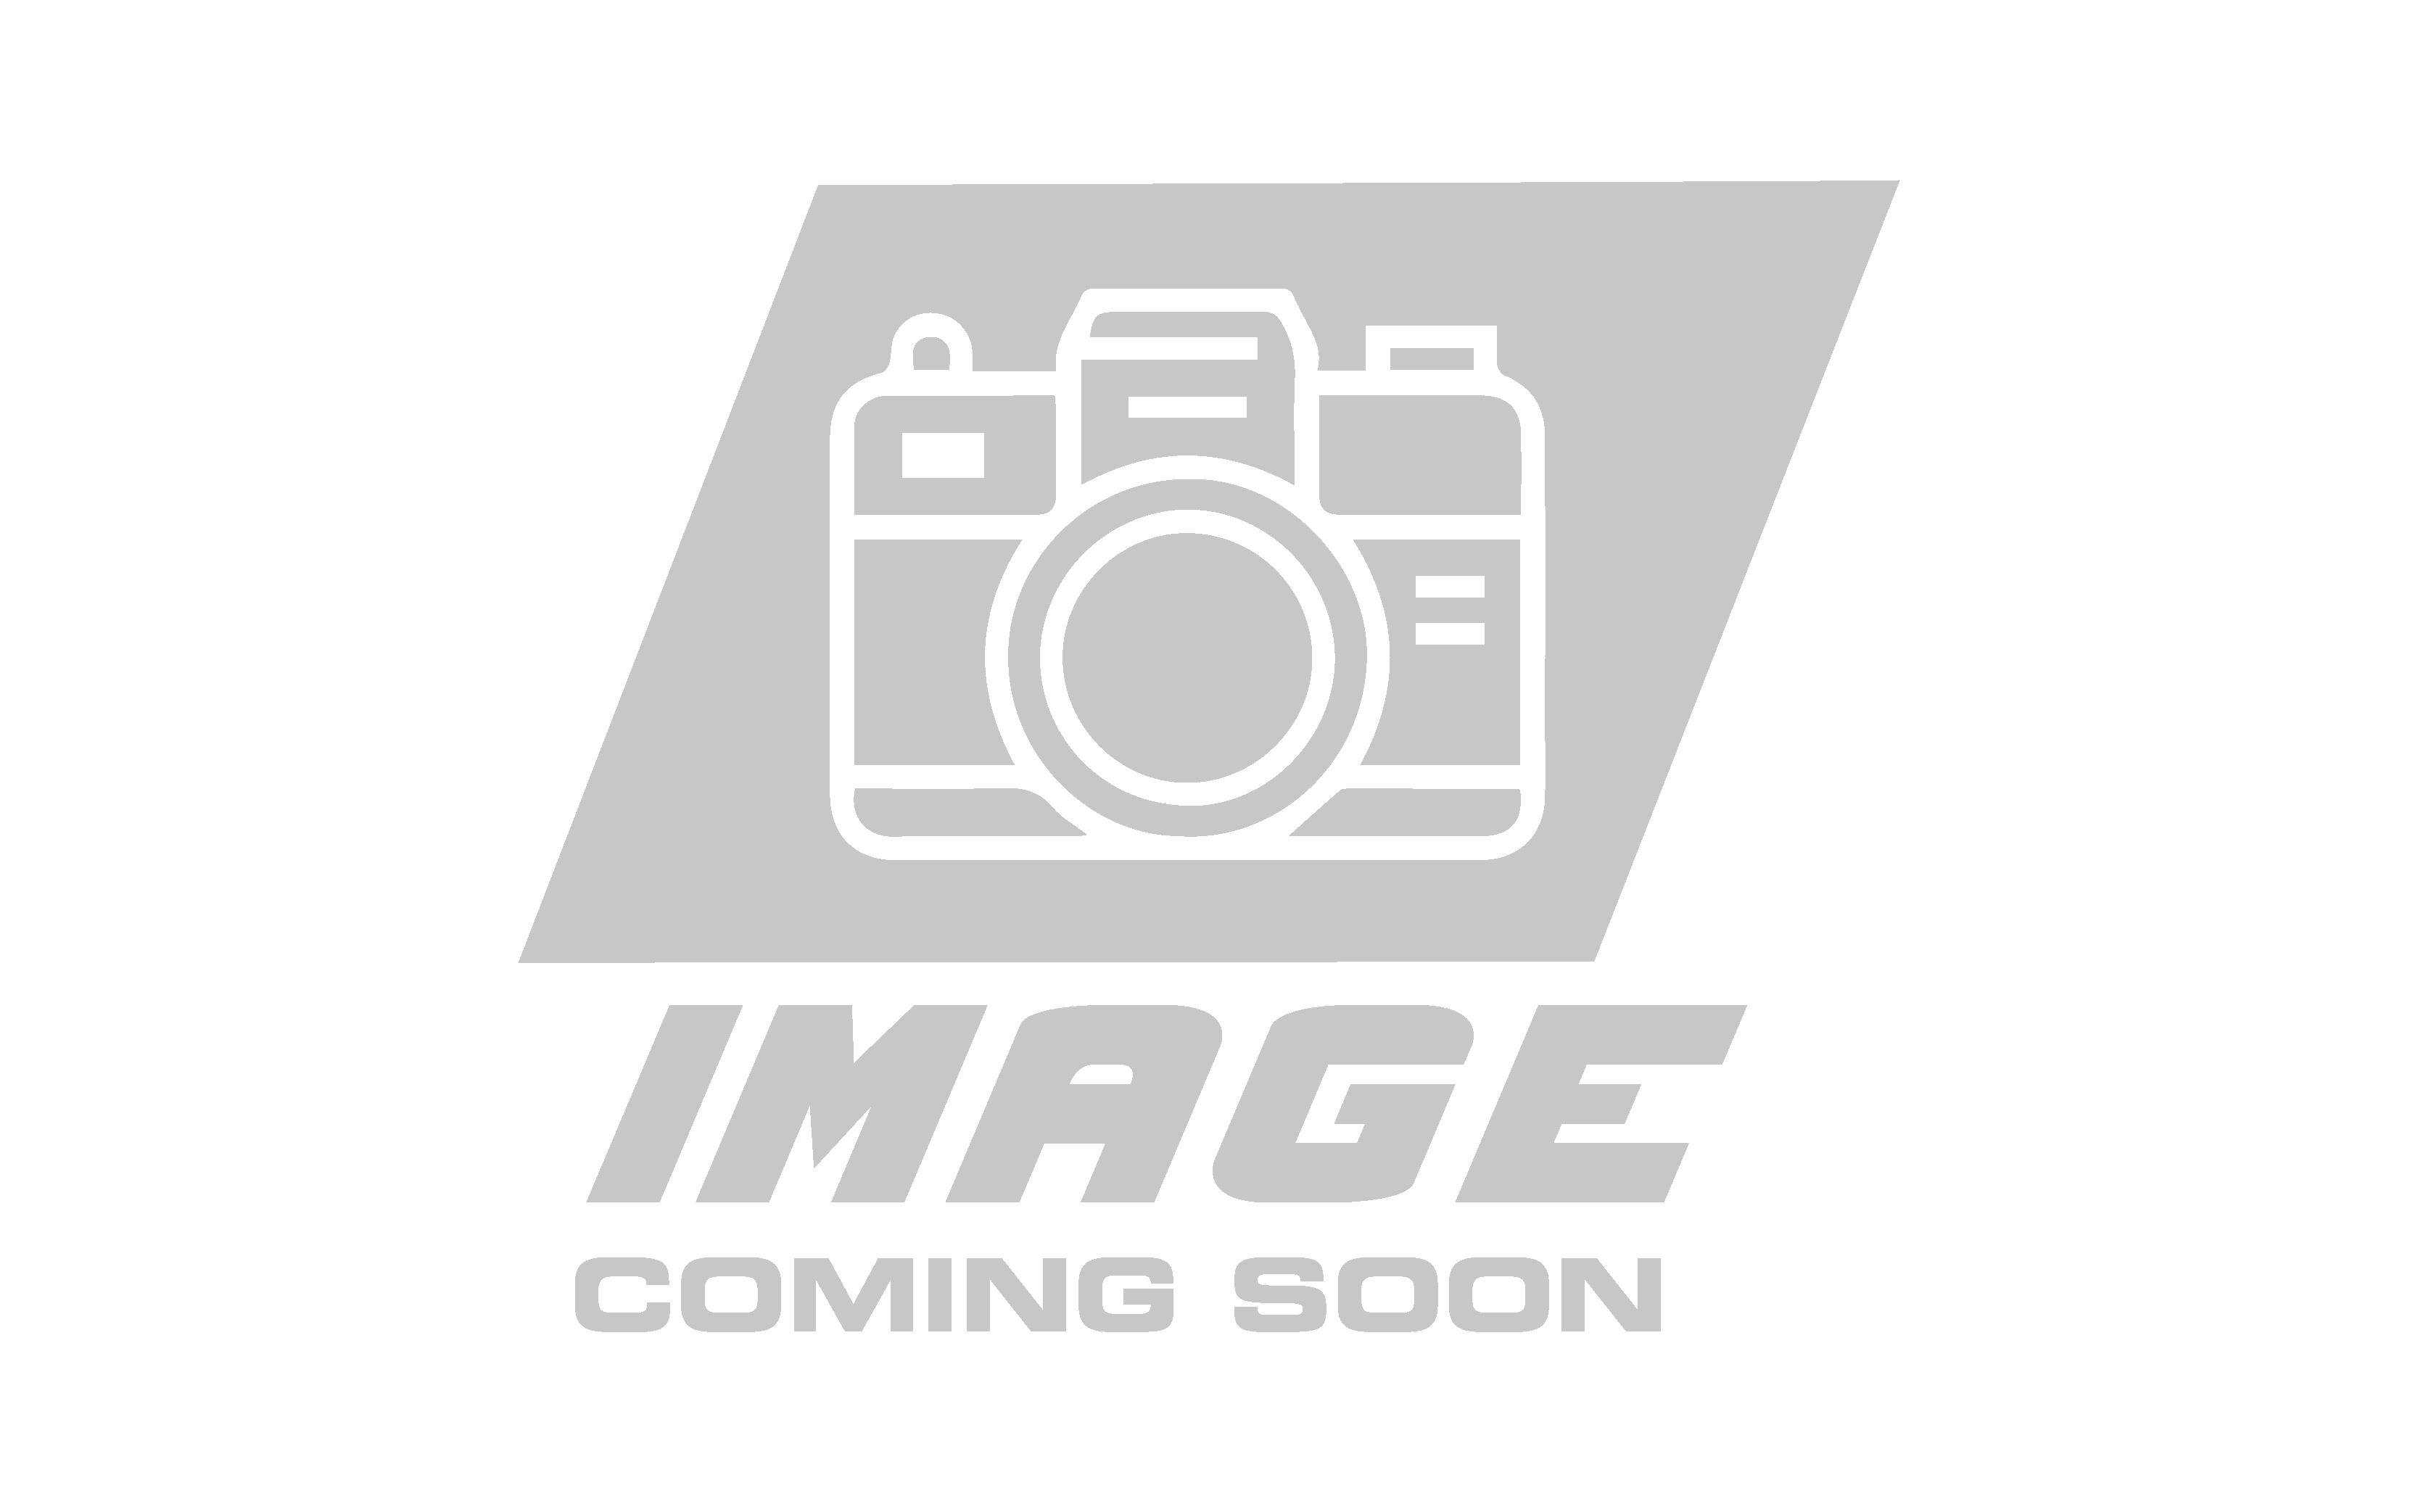 dodge_ram_1500_3rd_gen_air_lift_loadlifter_5000_ultimate_rear_kit_88230